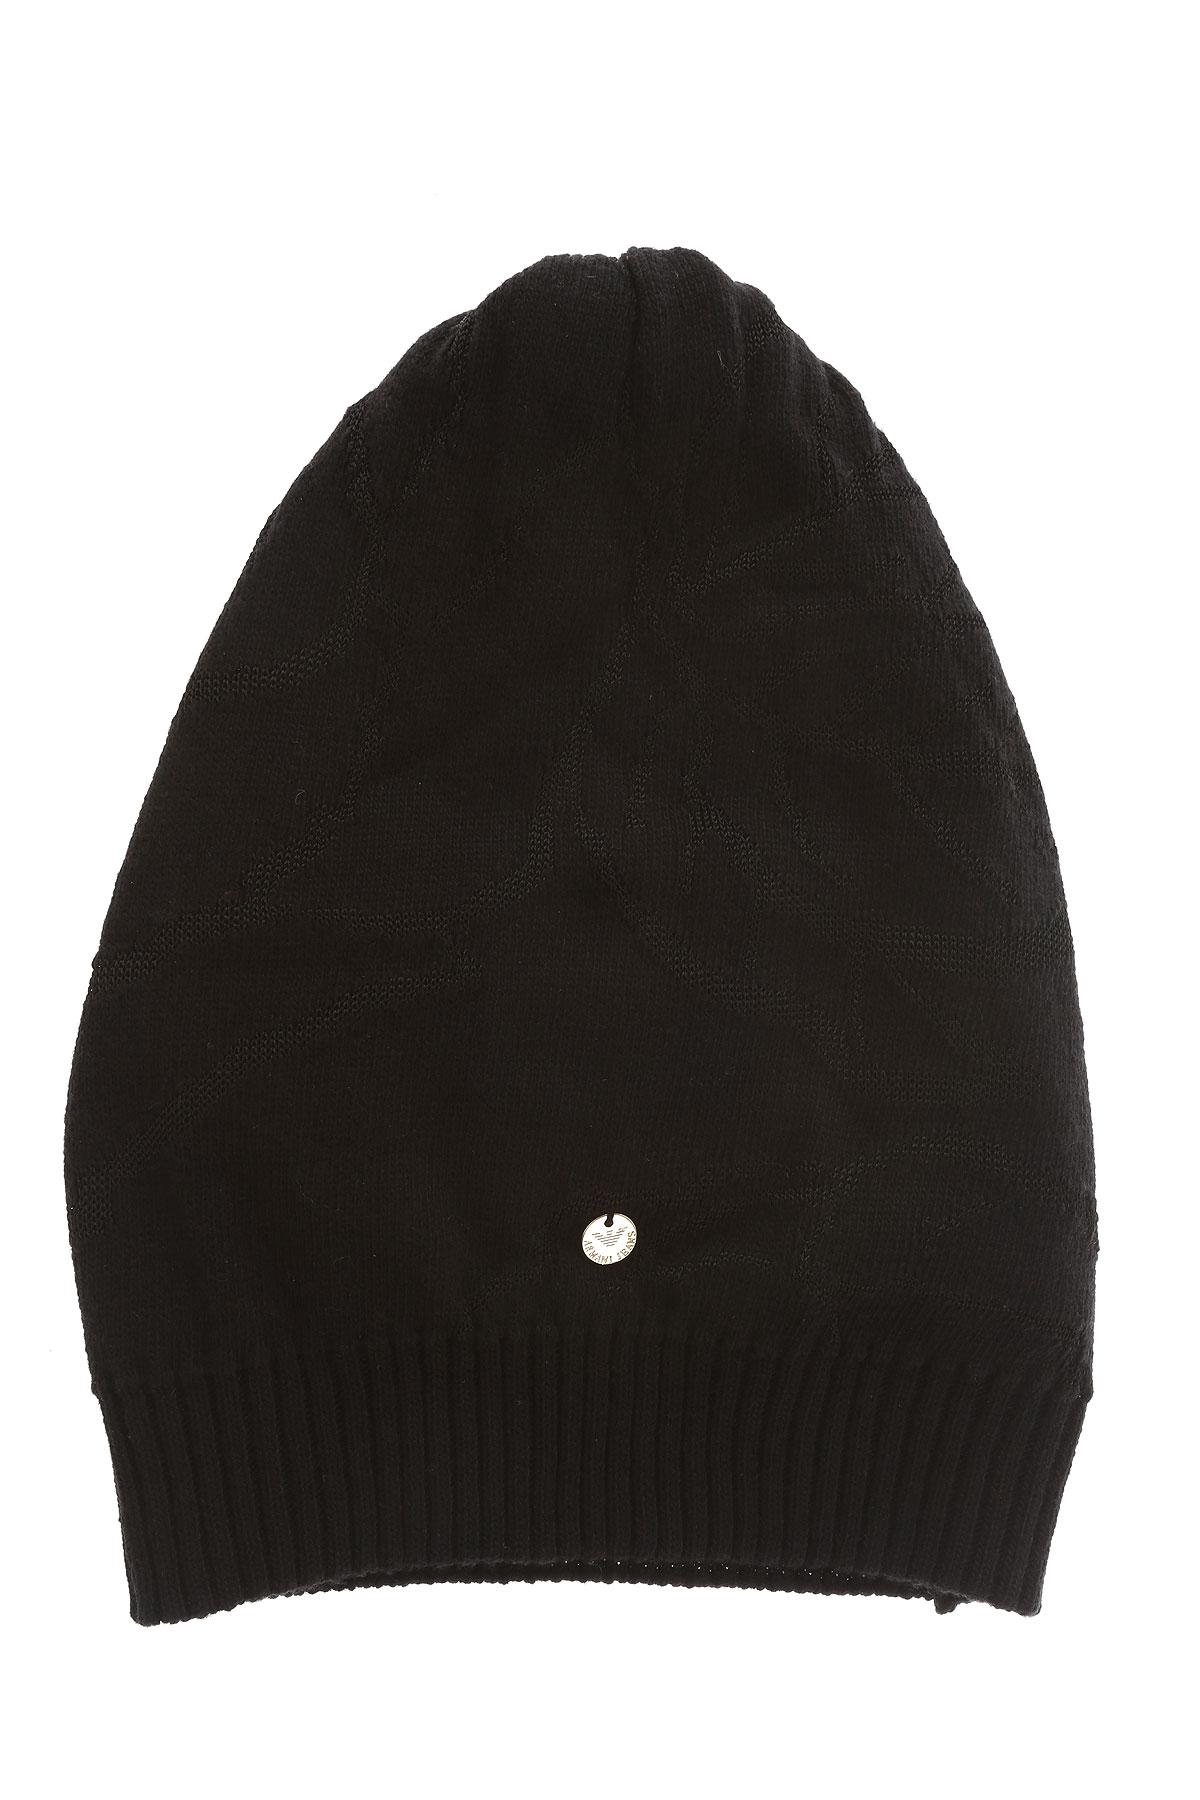 Image of Armani Jeans Hat for Women On Sale, Black, Viscose, 2017, III II I